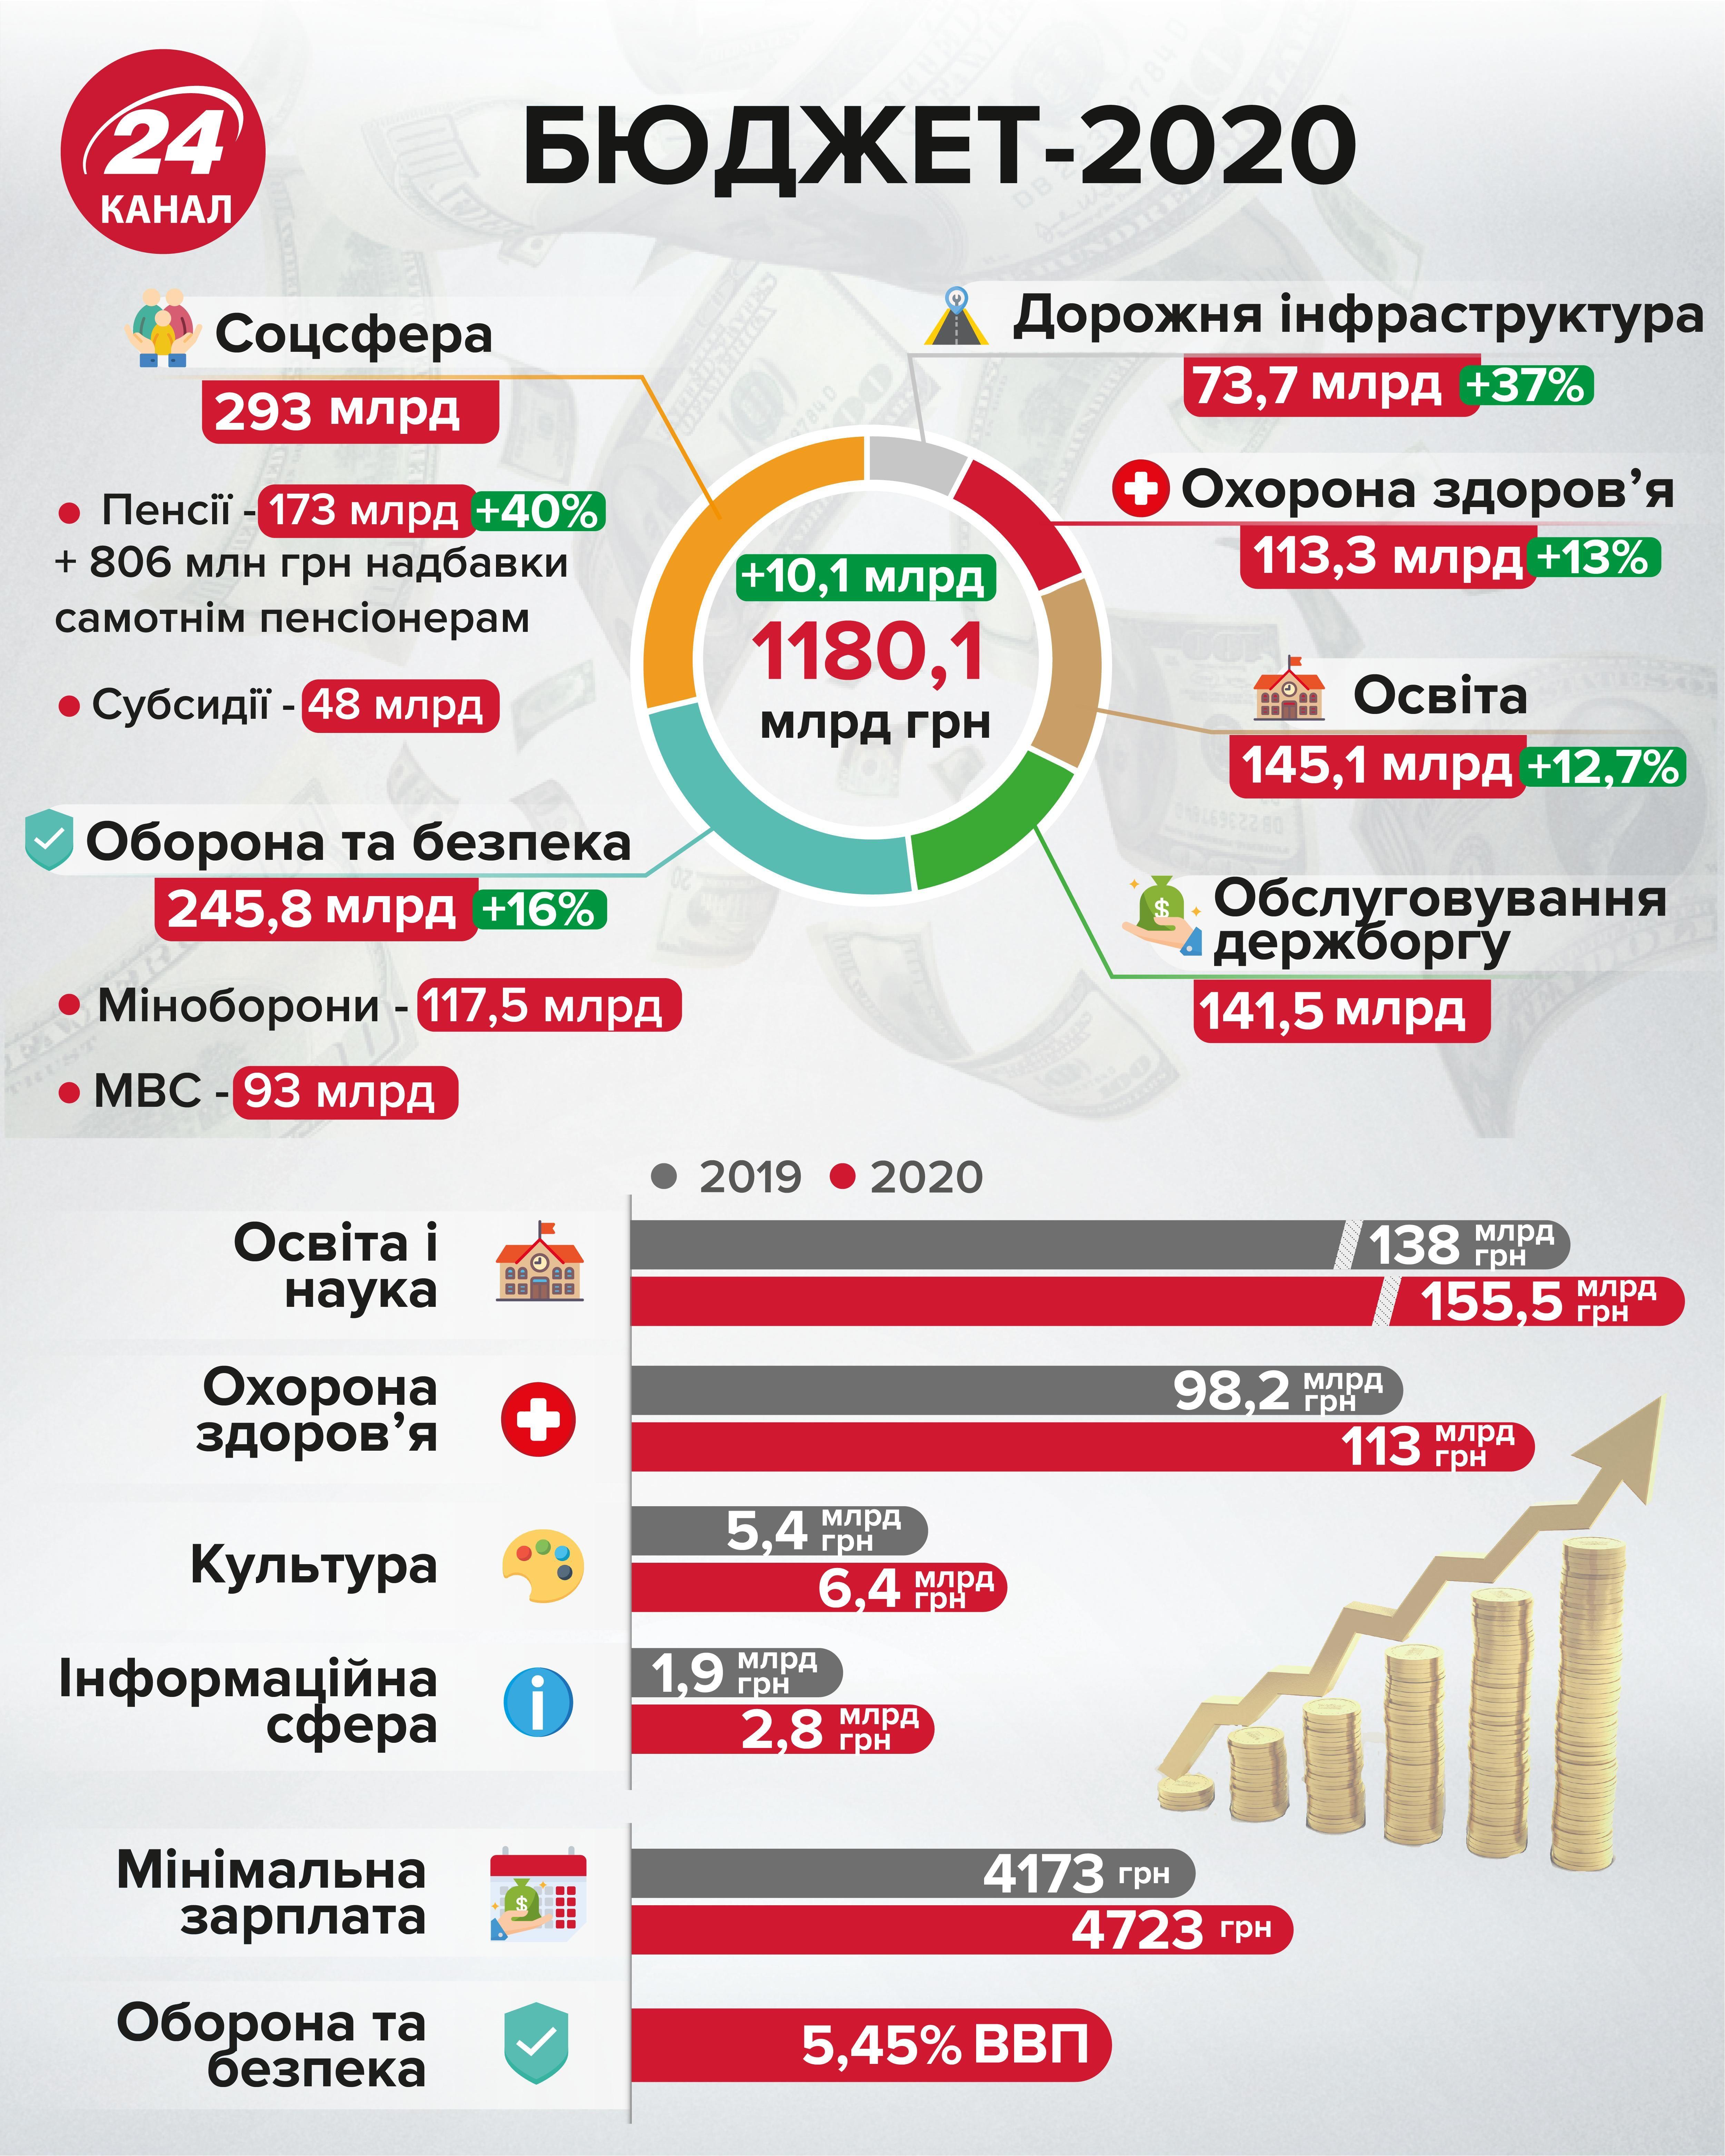 бюджет України на 2020 рік